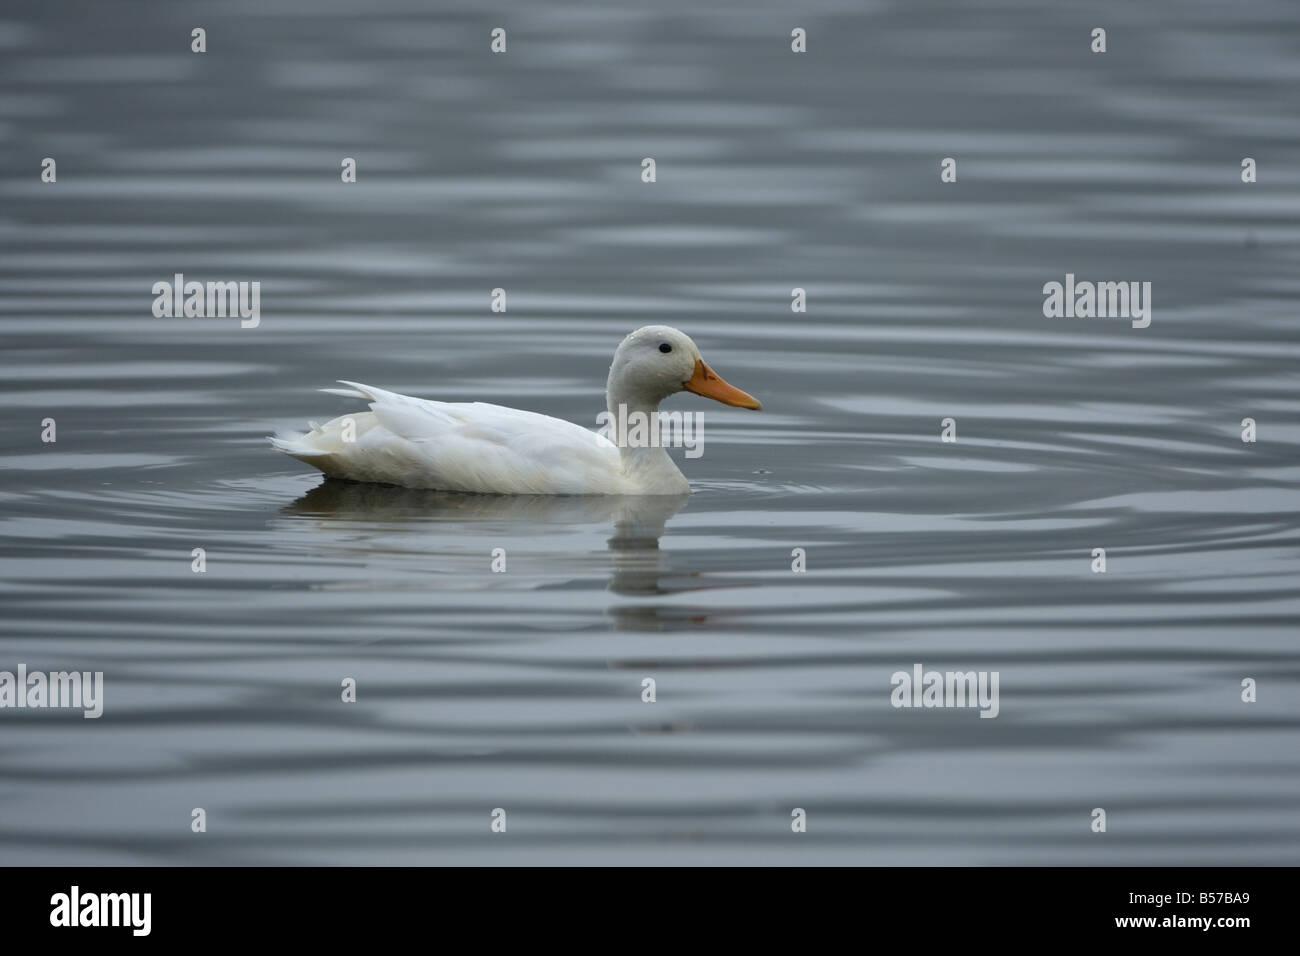 Pekin Aylesbury Duck Mallard Anas platyrhynchos - Stock Image